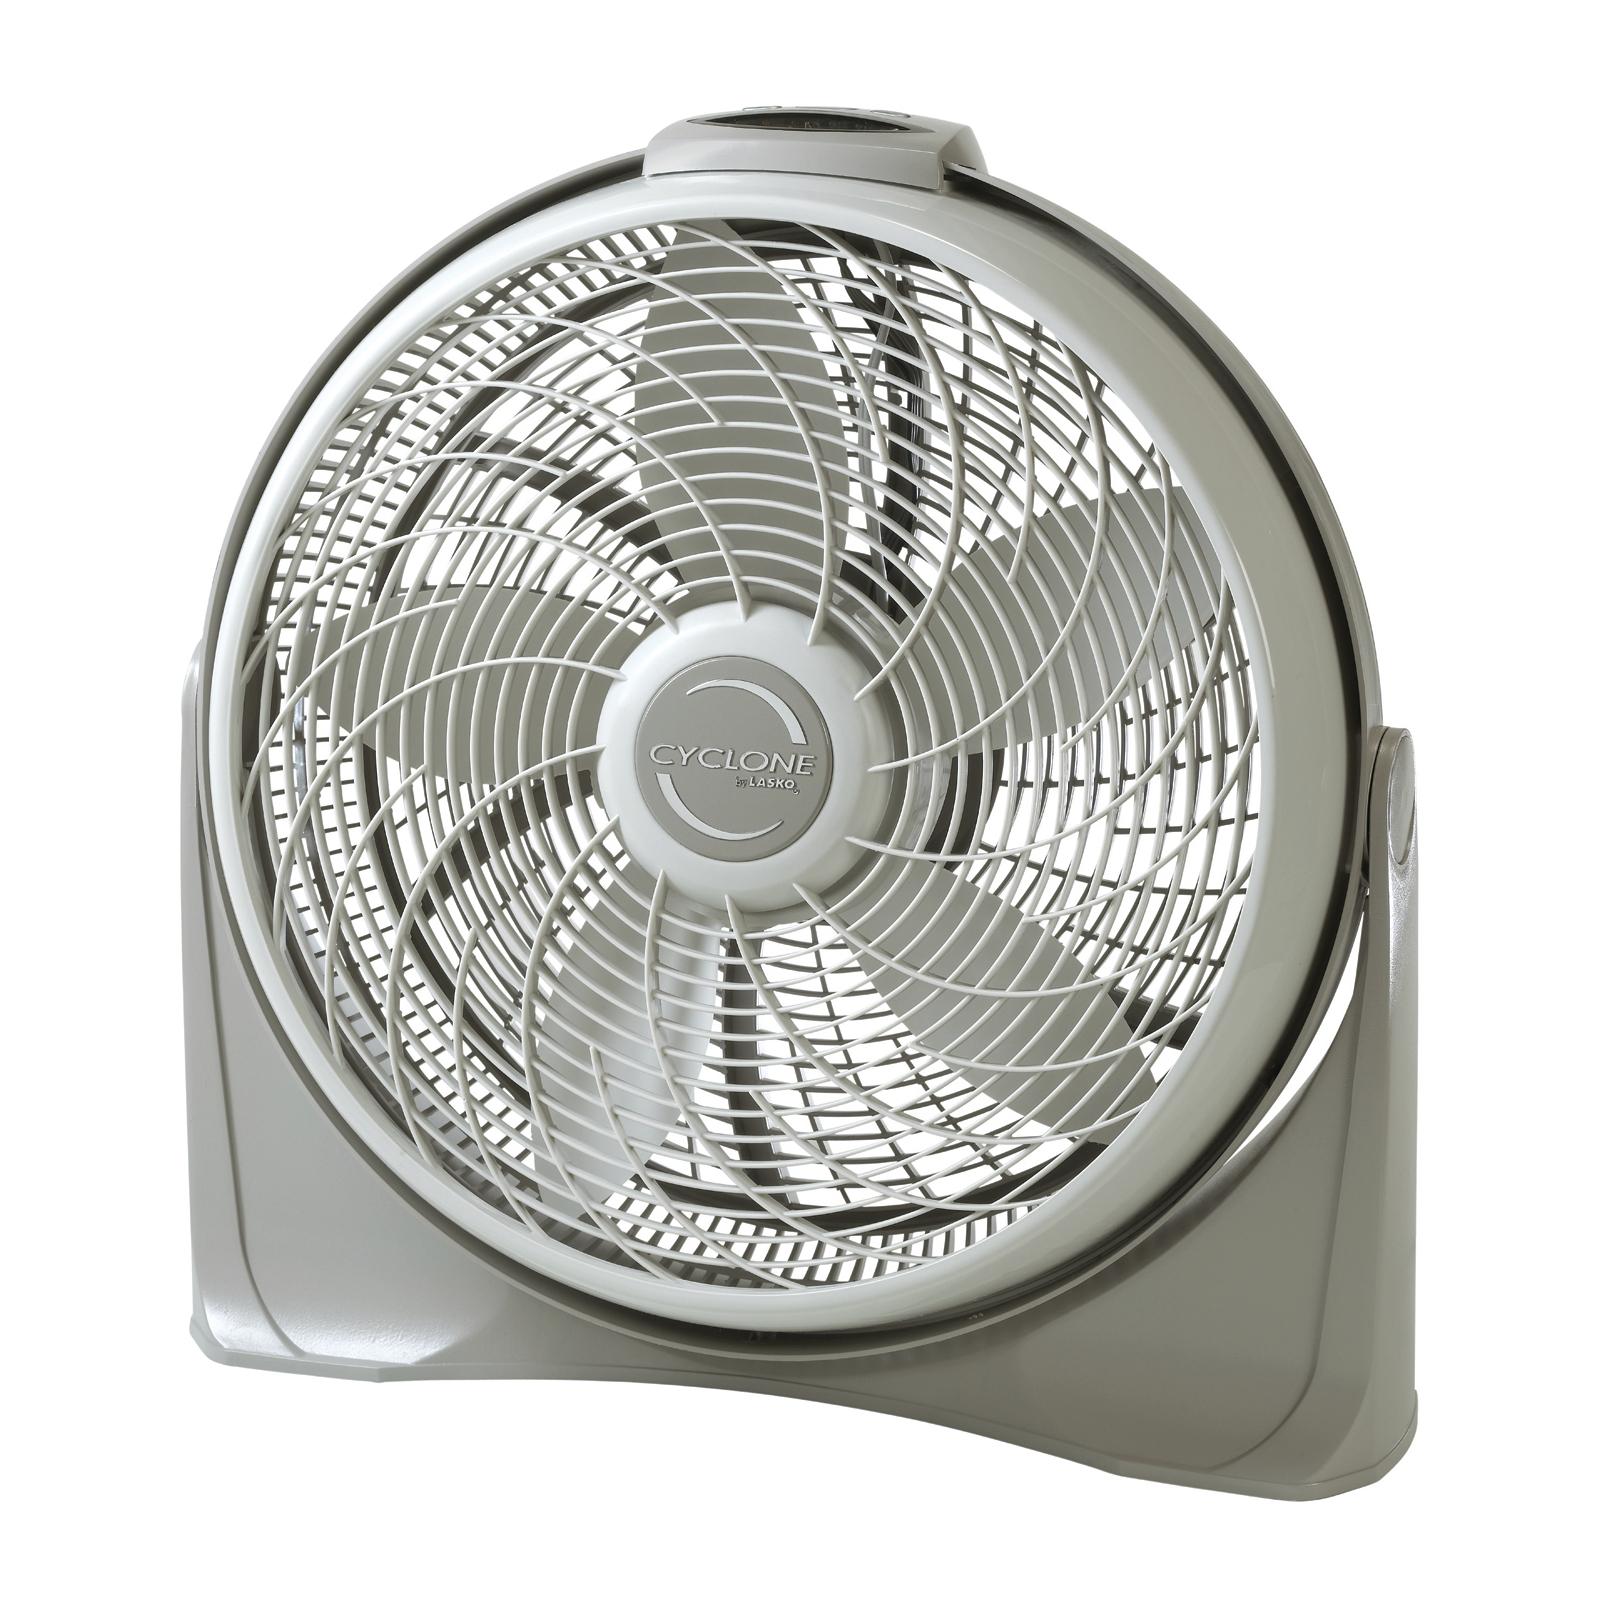 Lasko 20 Cyclone Fan with Remote